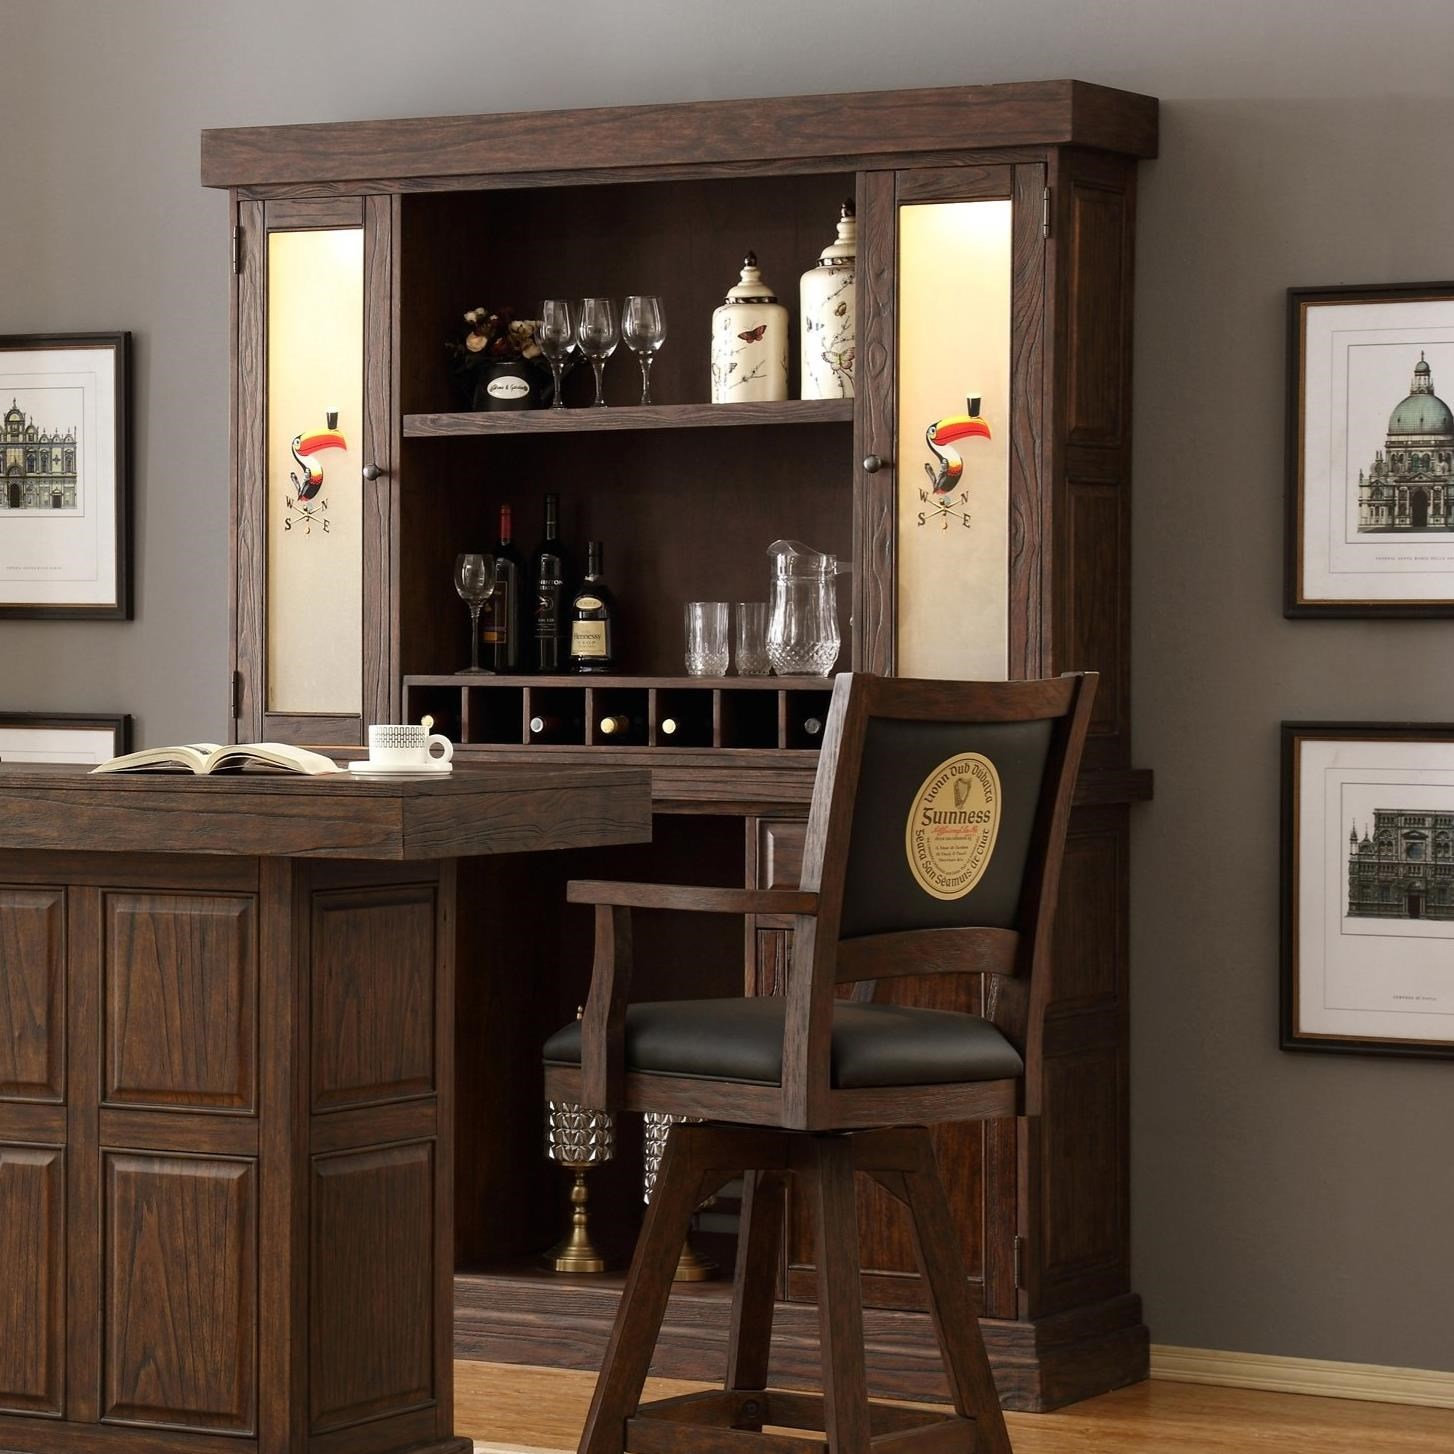 E C I Furniture Guinness Bar 0807 89 Bb H Back Bar And Hutch With Vented Area For Mini Fridge Corner Furniture Hutches